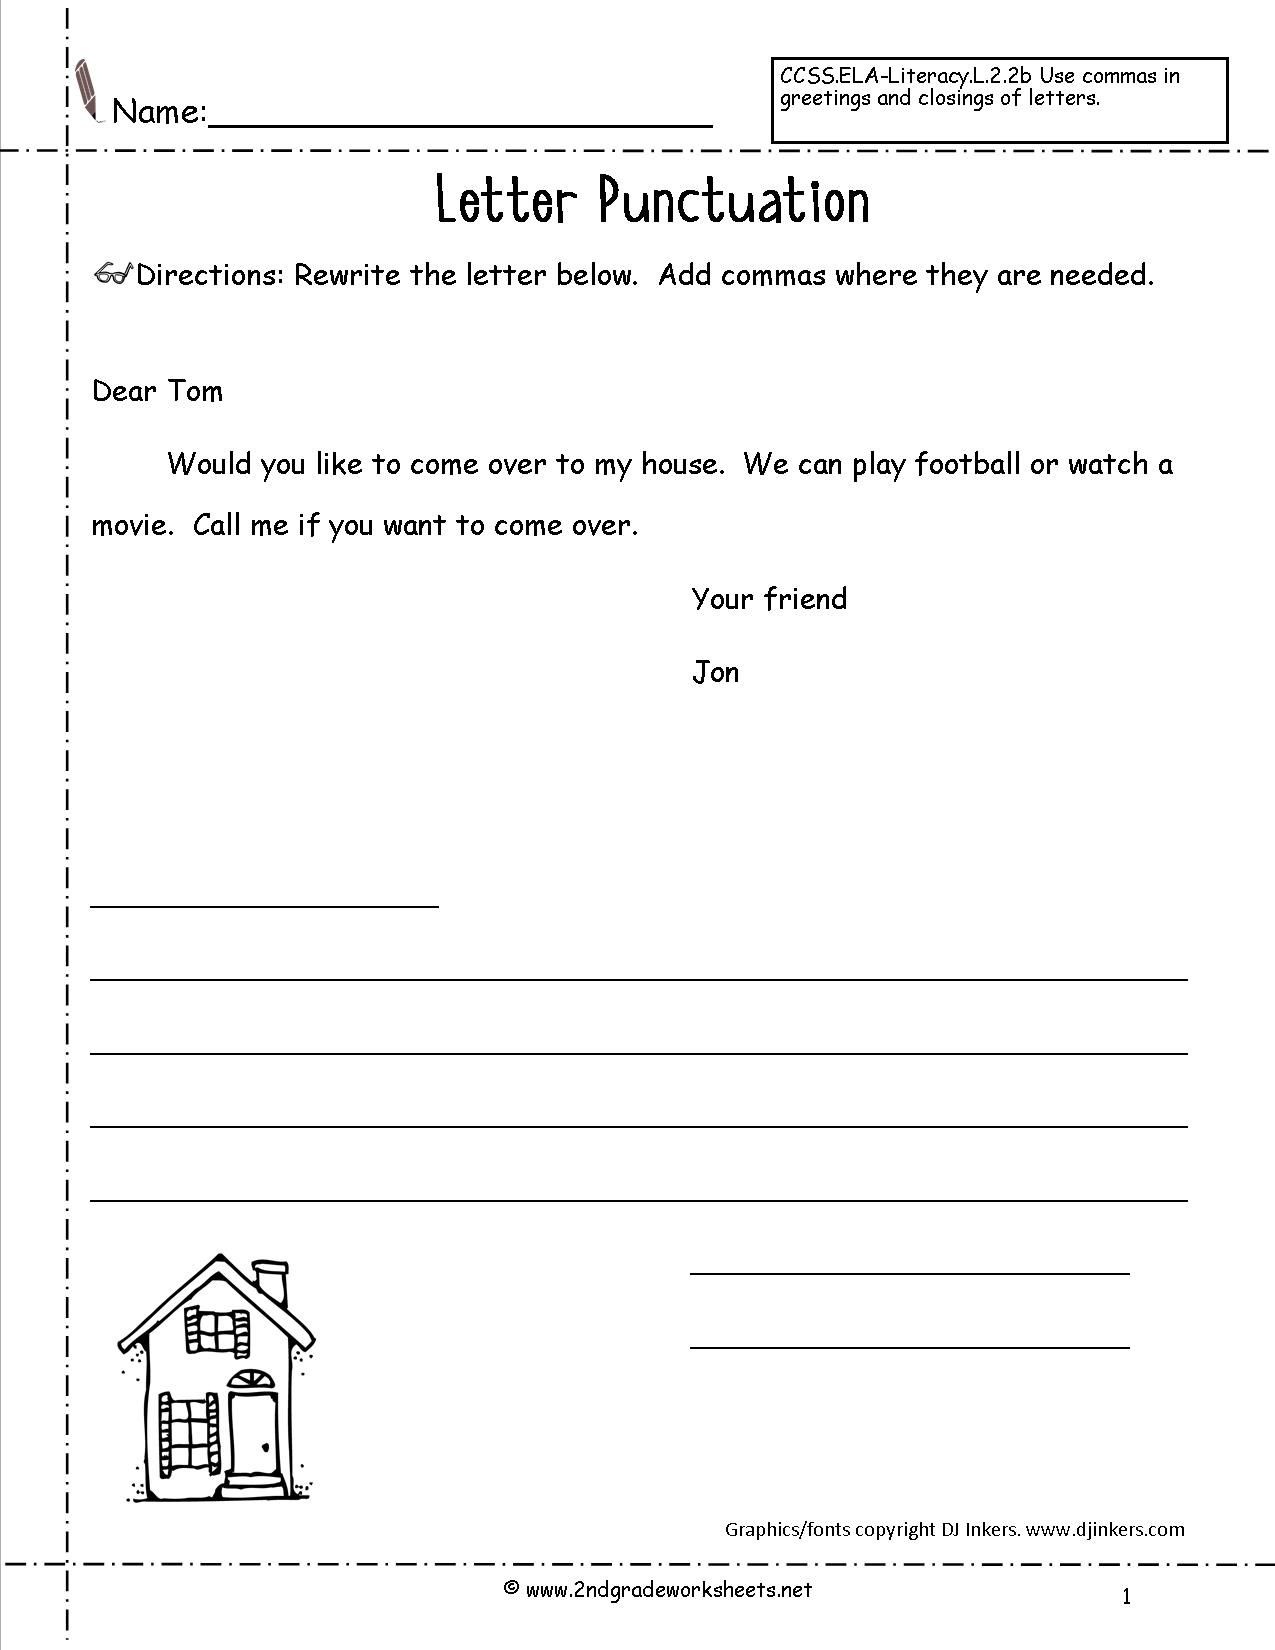 Letters and Parts of a Letter Worksheet   Kindergarten worksheets sight  words [ 1650 x 1275 Pixel ]